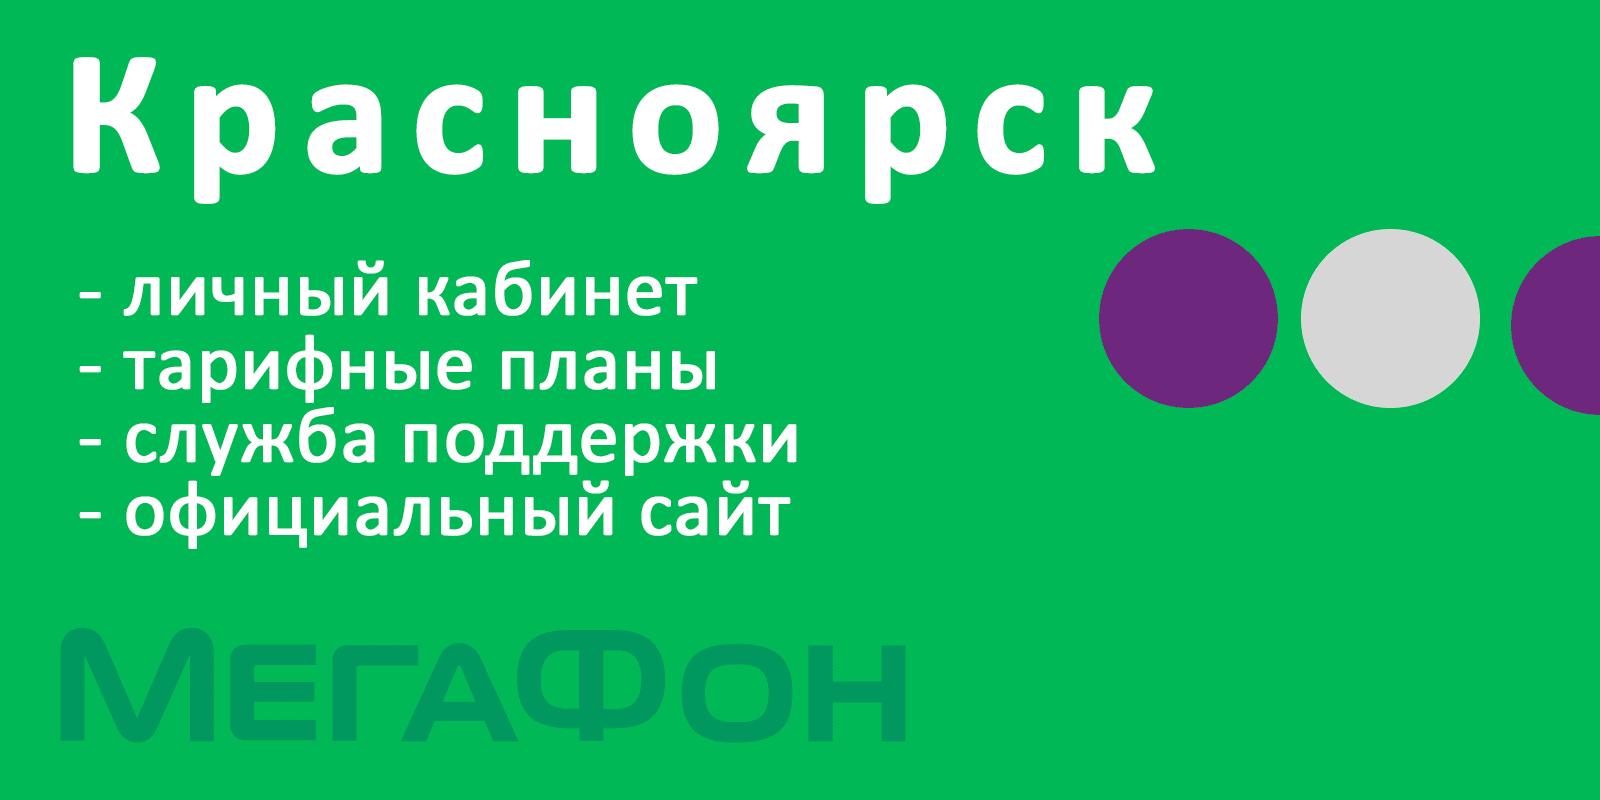 site-megafon-krasnoyarsk.png